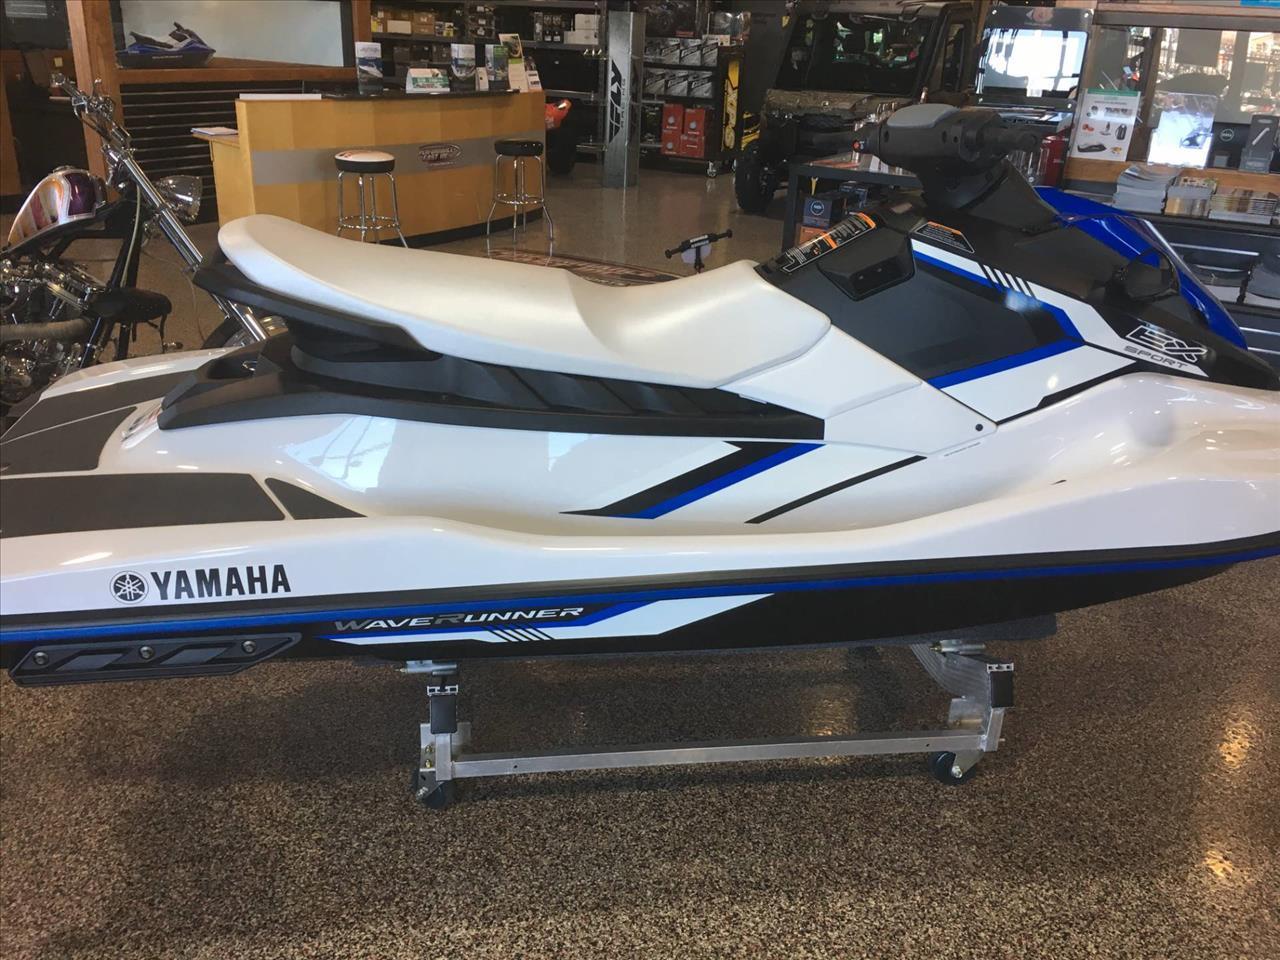 2017 Yamaha WAVERUNNER EX SPORT for sale at Vehicle Network, LLC - Performance East, INC. in Goldsboro NC